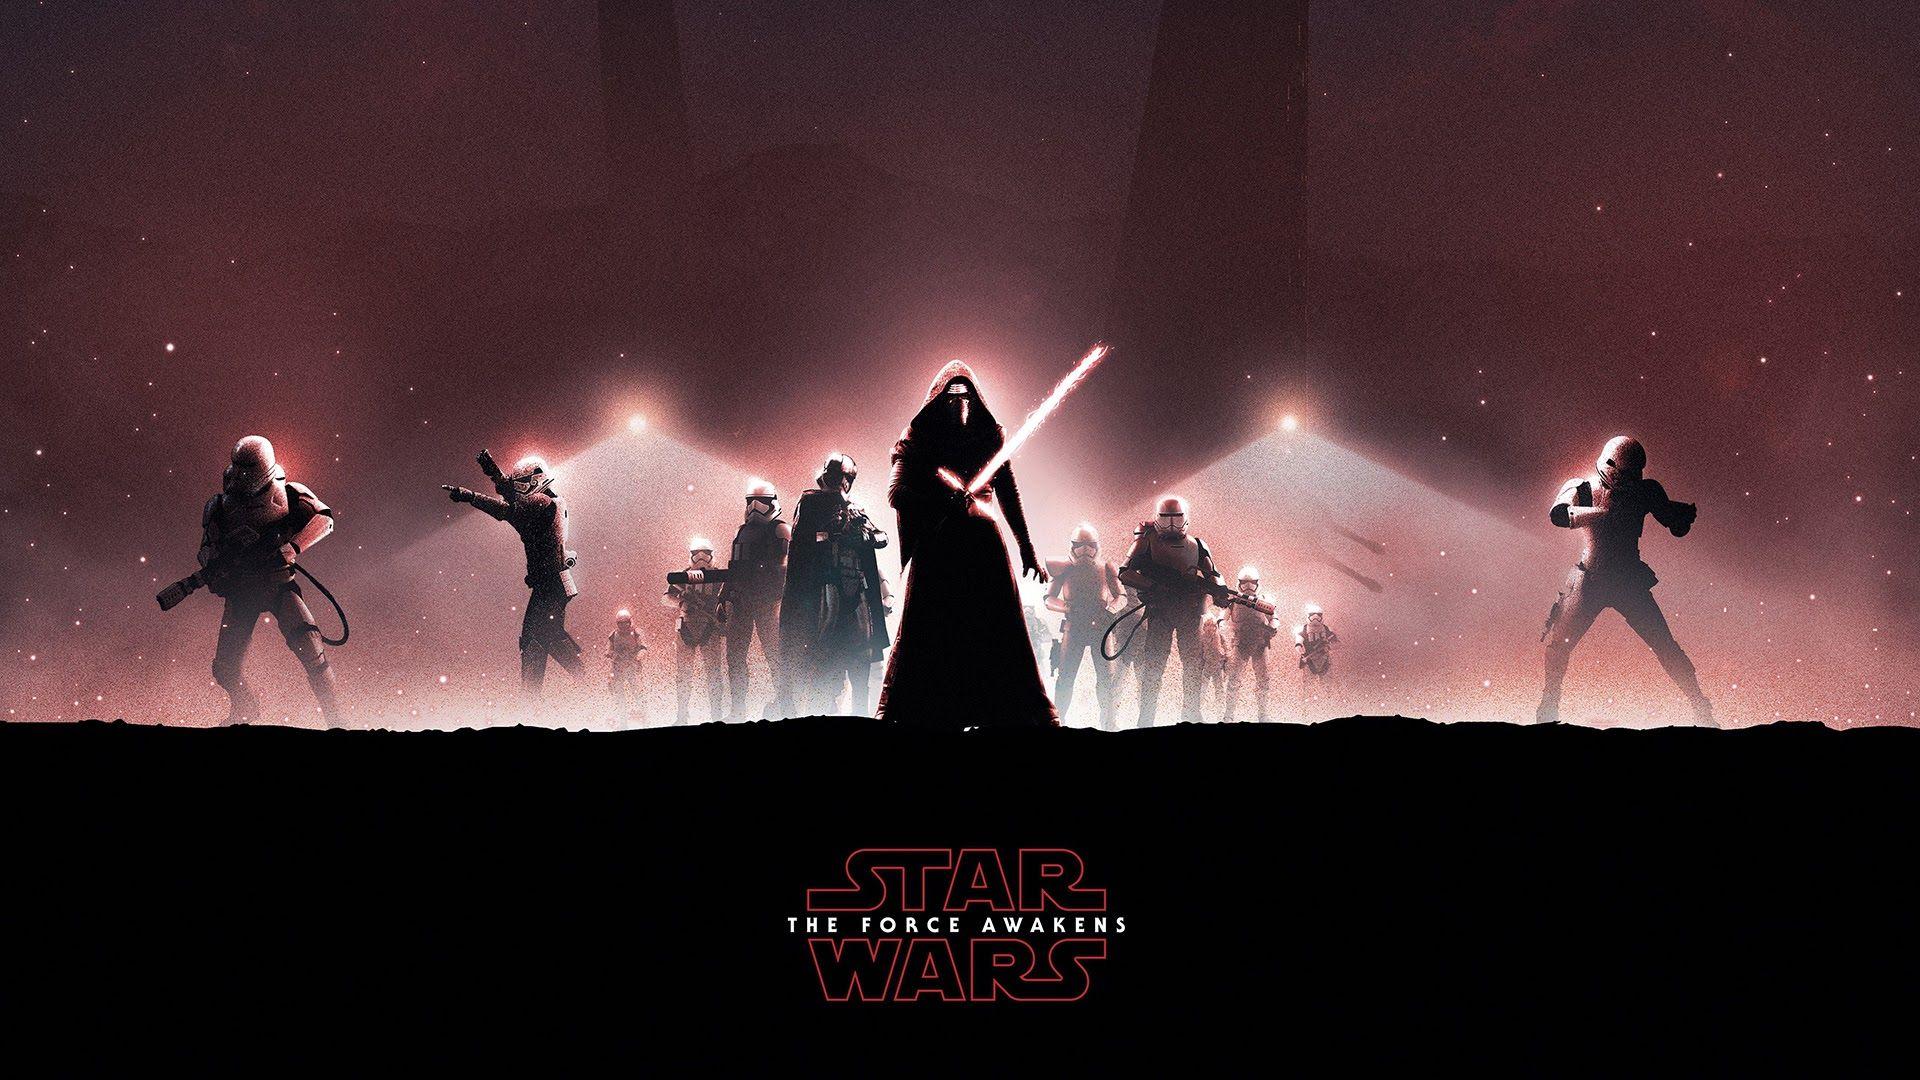 Star Wars Wallpaper Hd Star Wars Wallpaper Kylo Ren Poster Star Wars Background